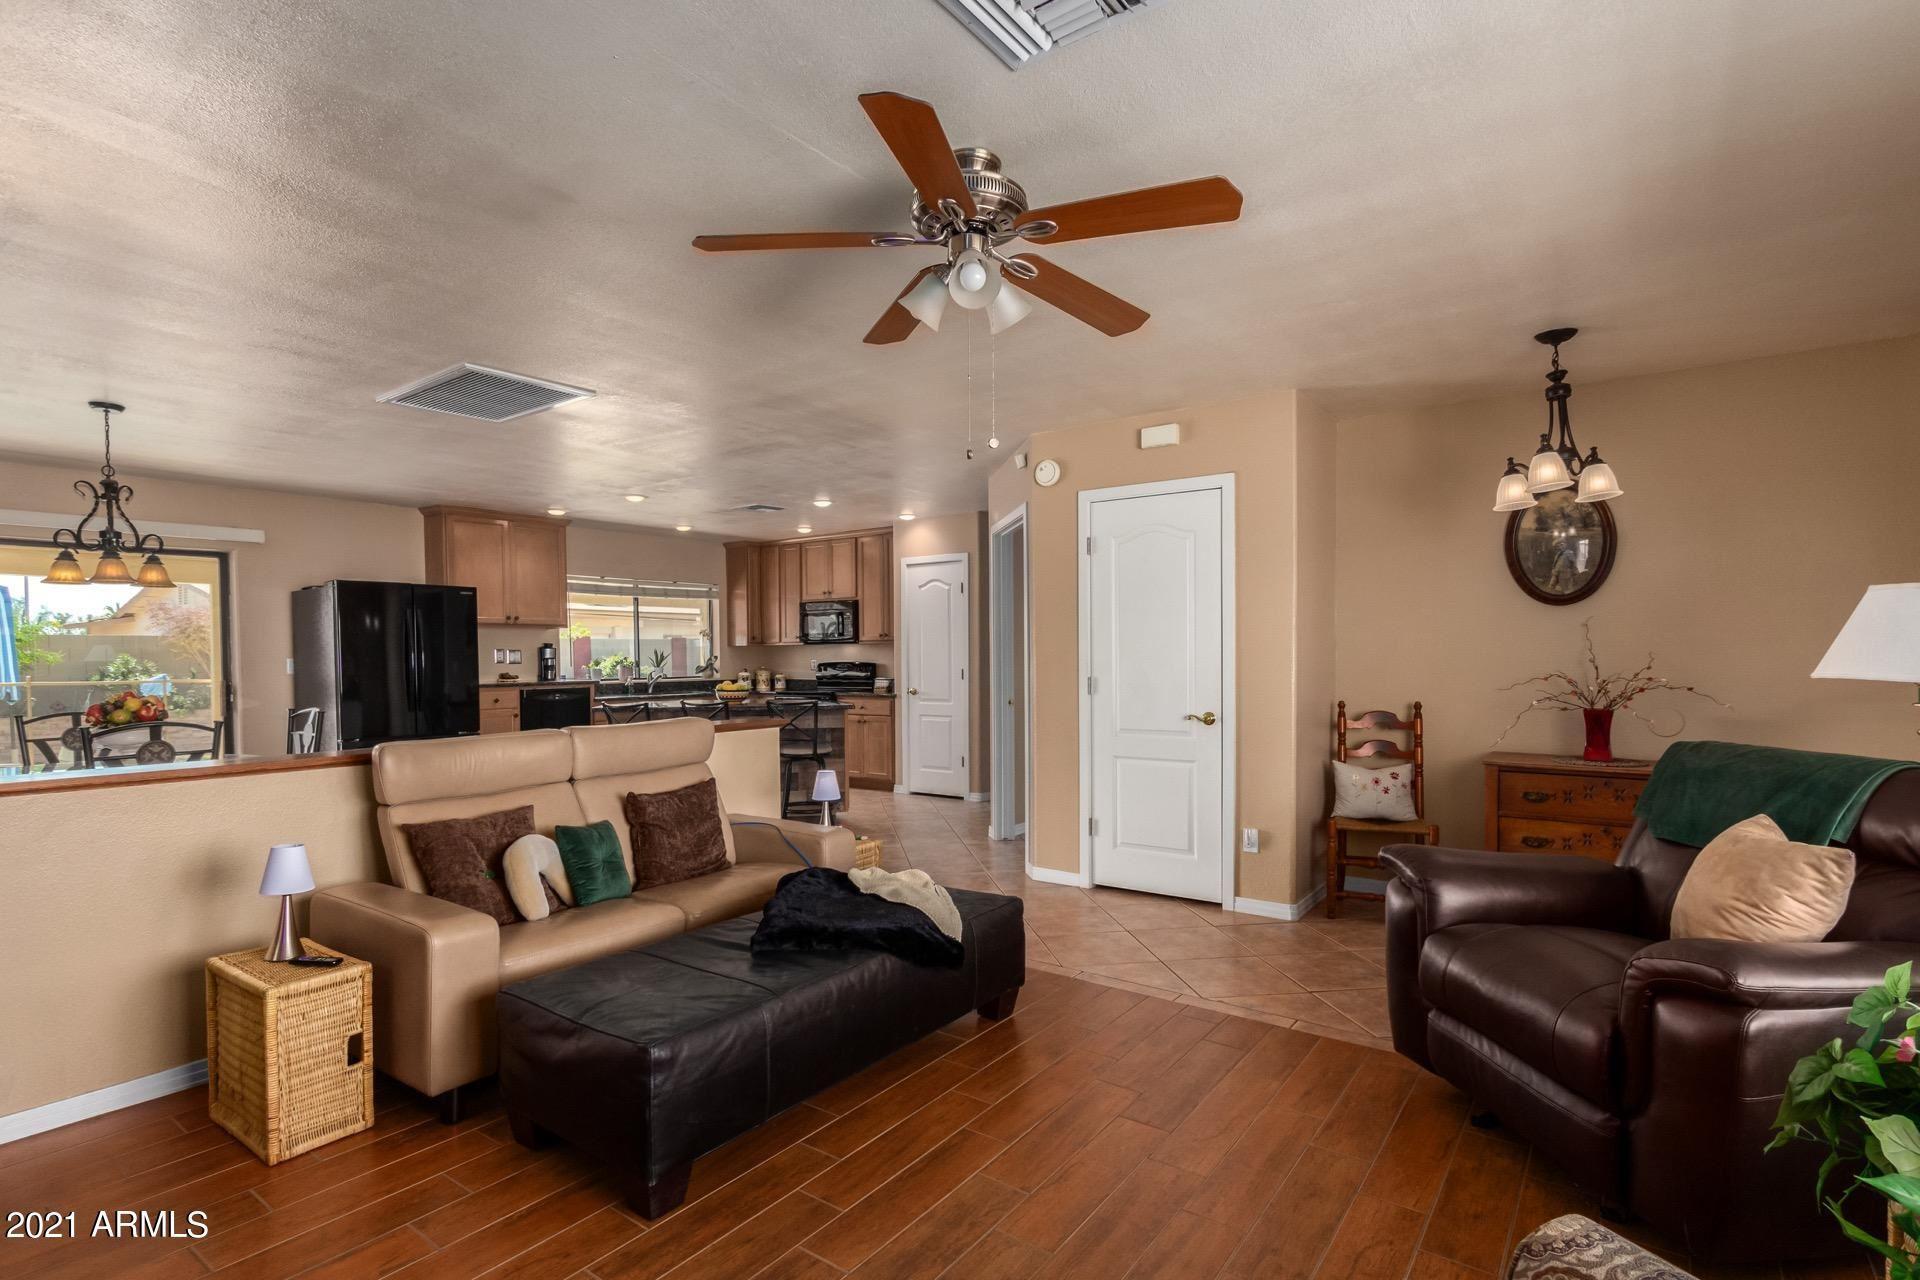 Photo of 4819 W CHRISTY Drive, Glendale, AZ 85304 (MLS # 6200387)